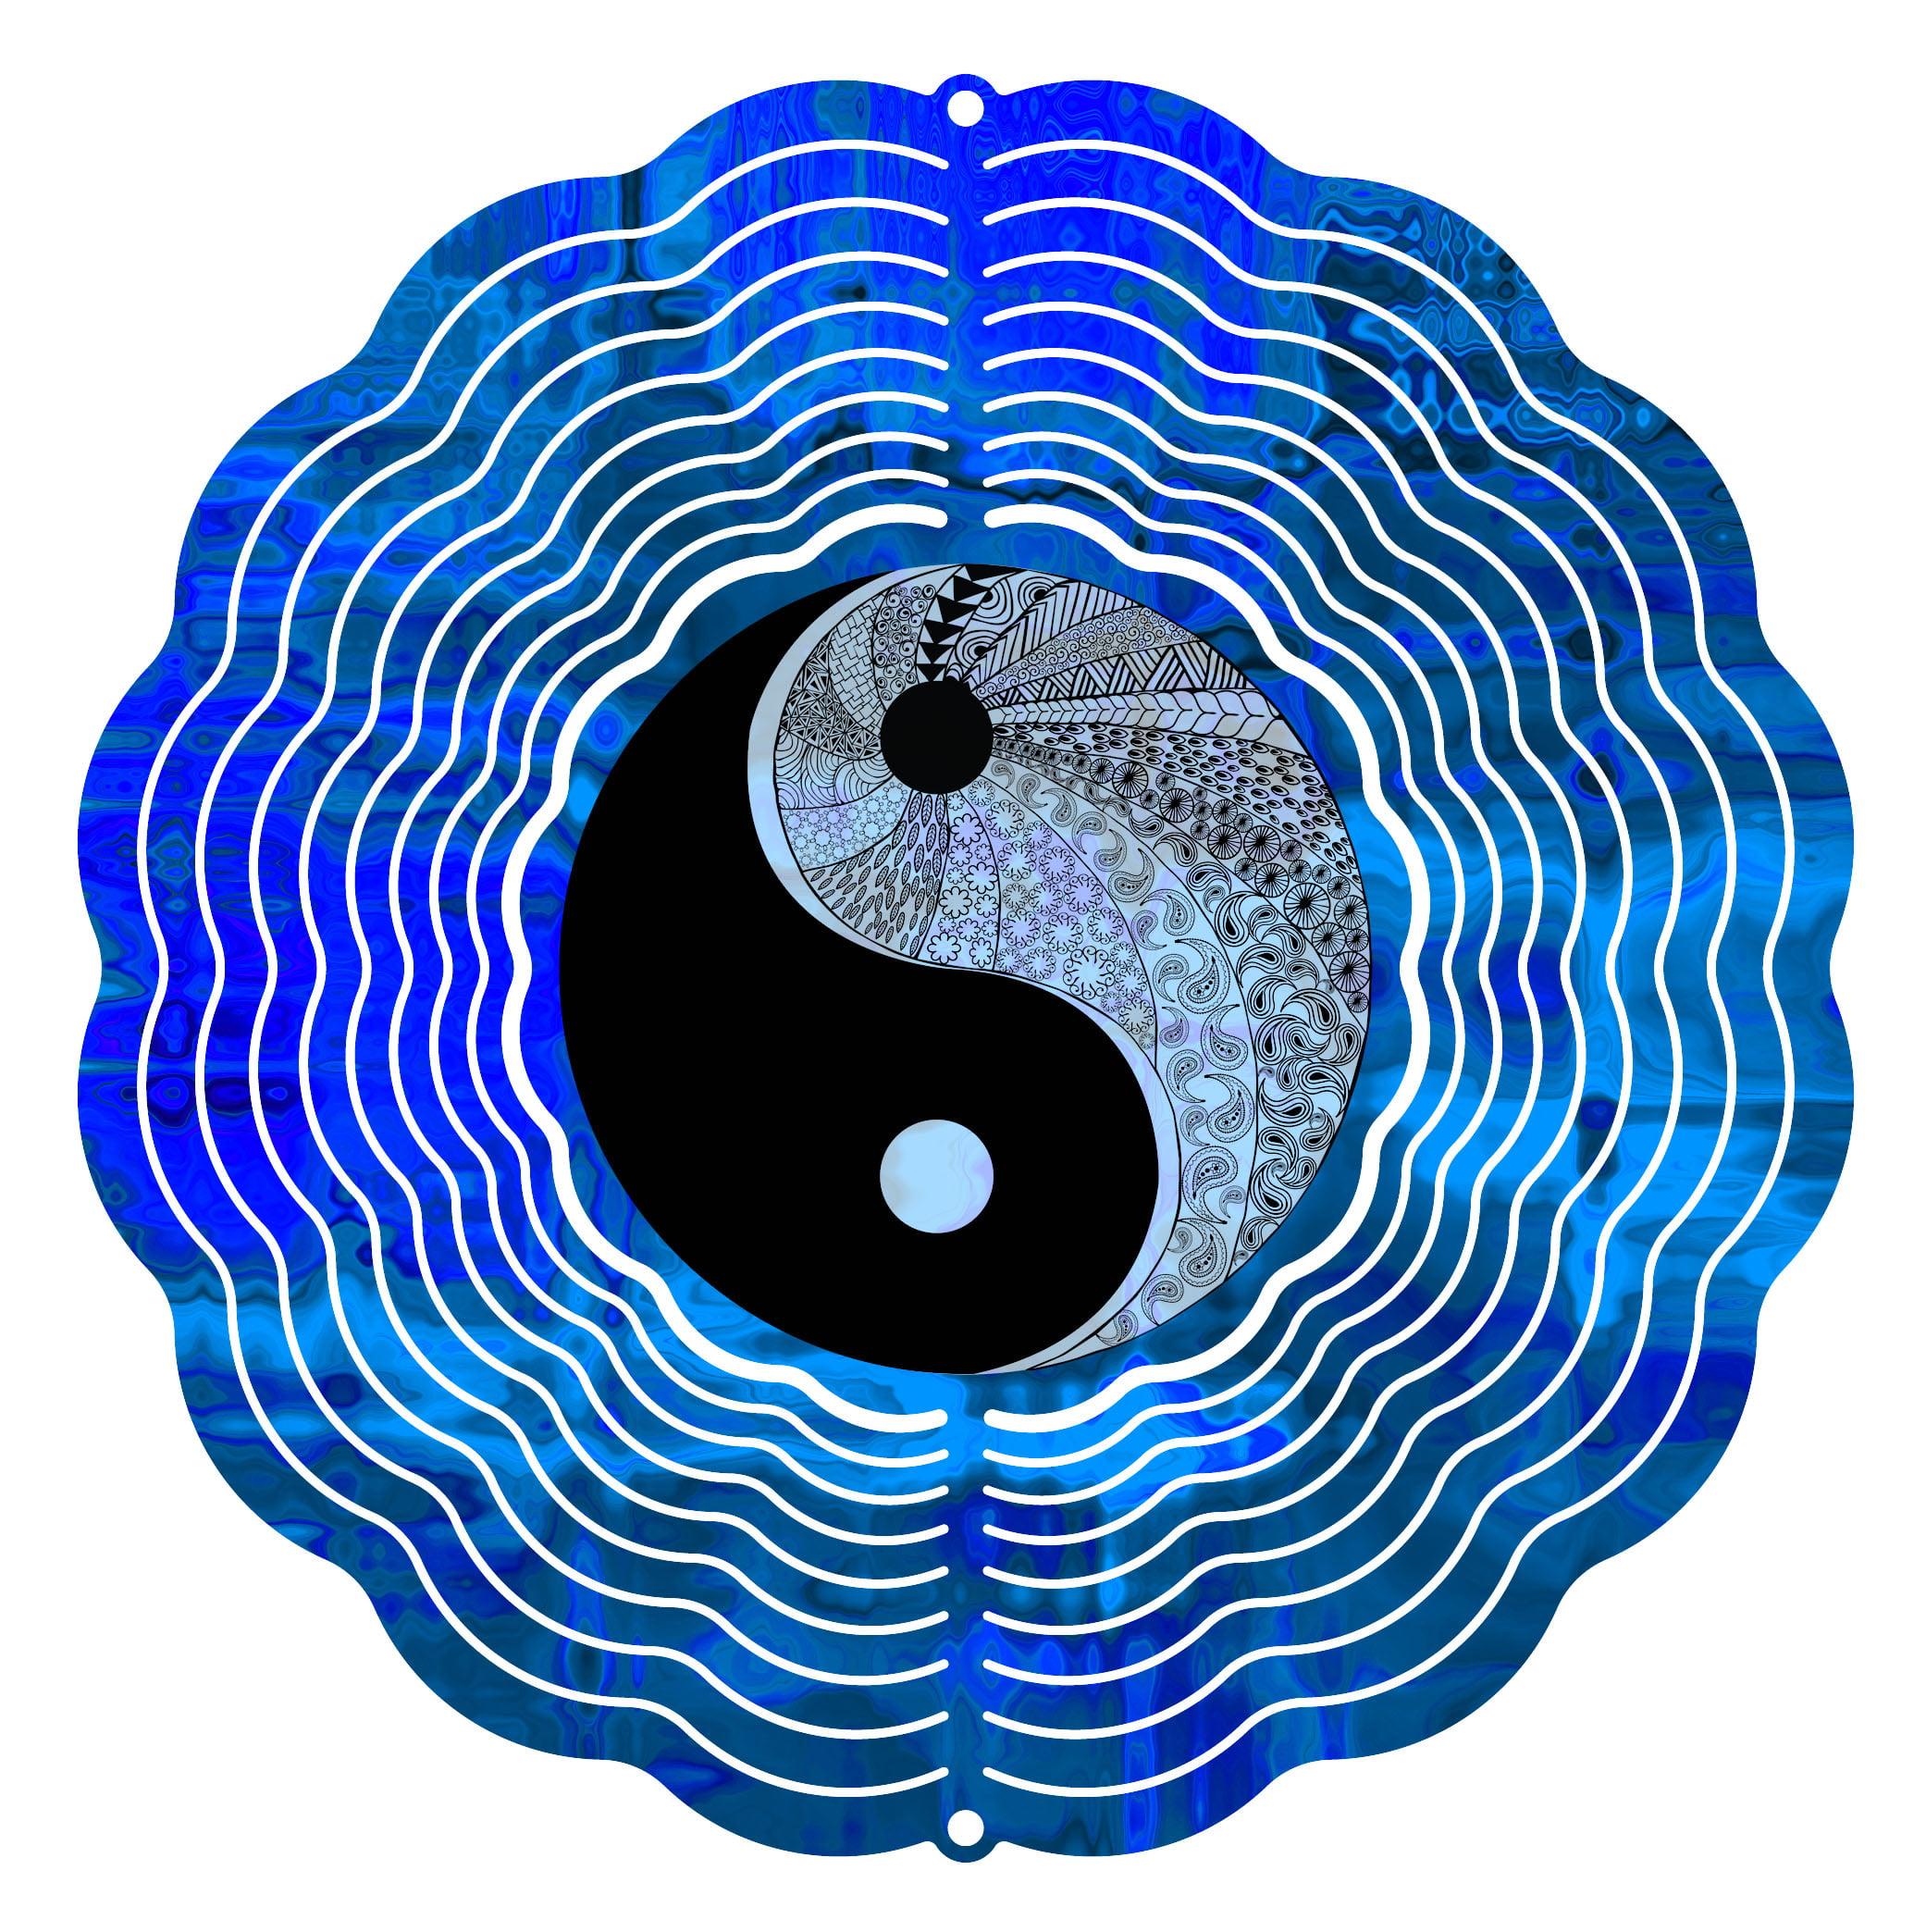 Next Innovations 10 in. Yin Yang Zen Wind Spinner by Next Innovations